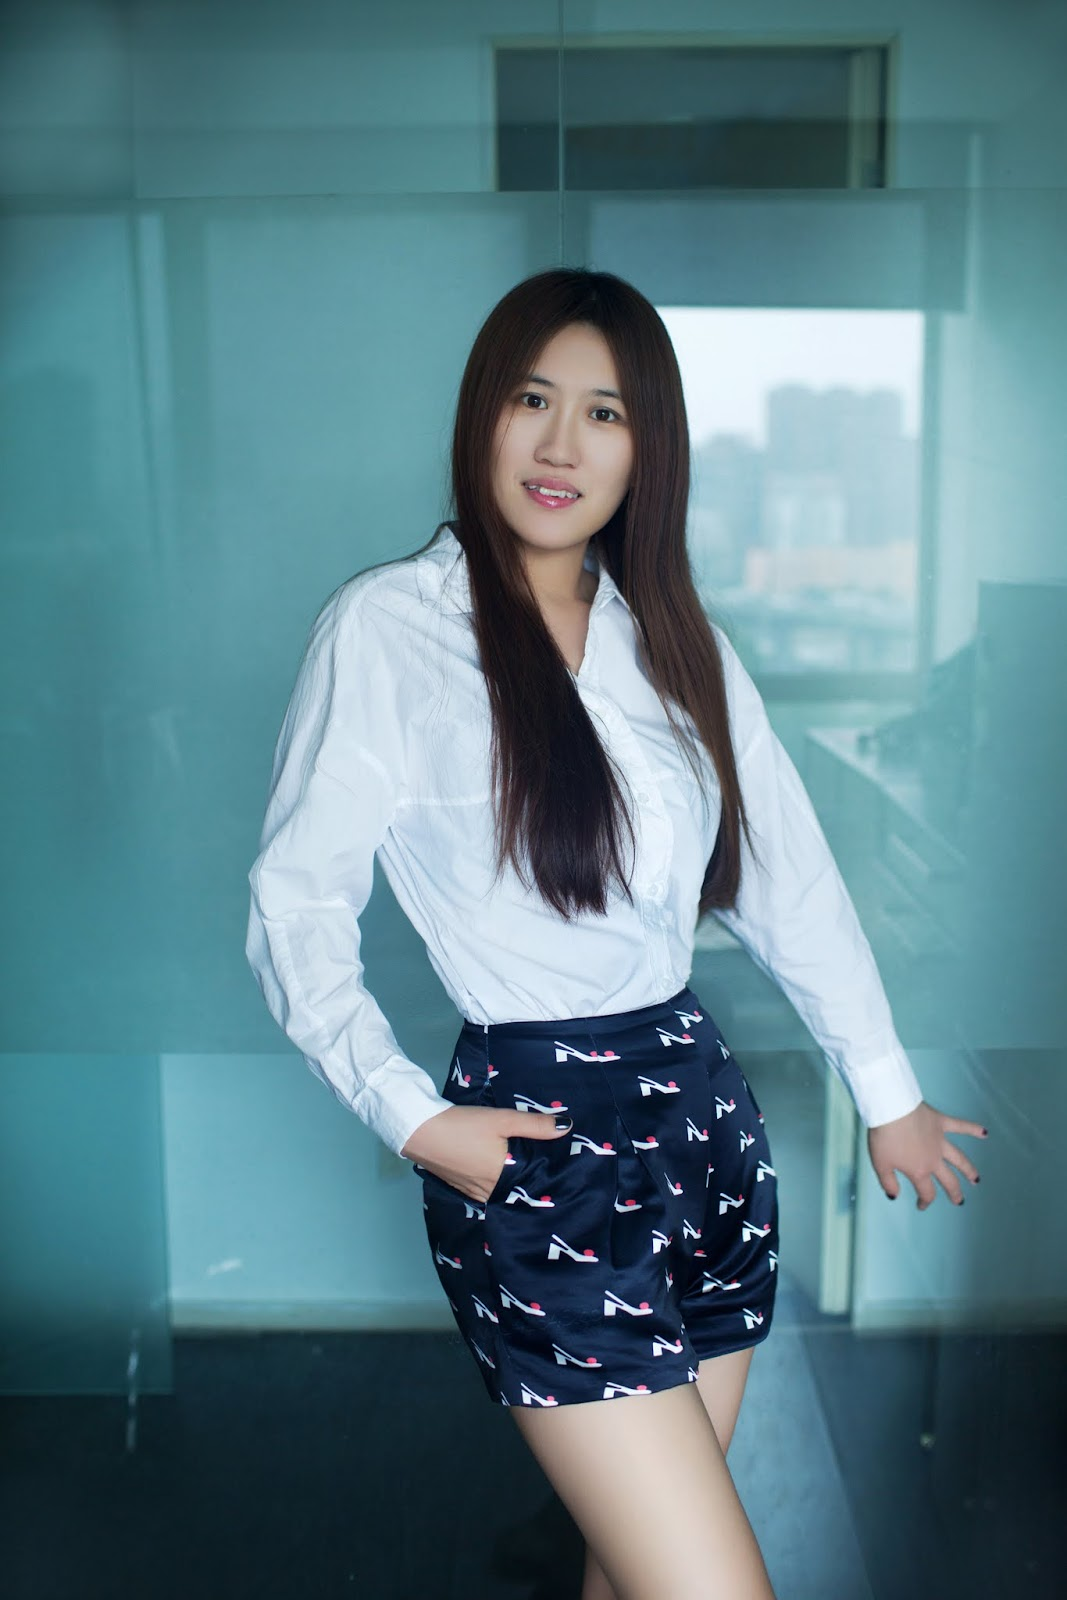 Jessica%2B%25286%2529 - TuiGirl No.60